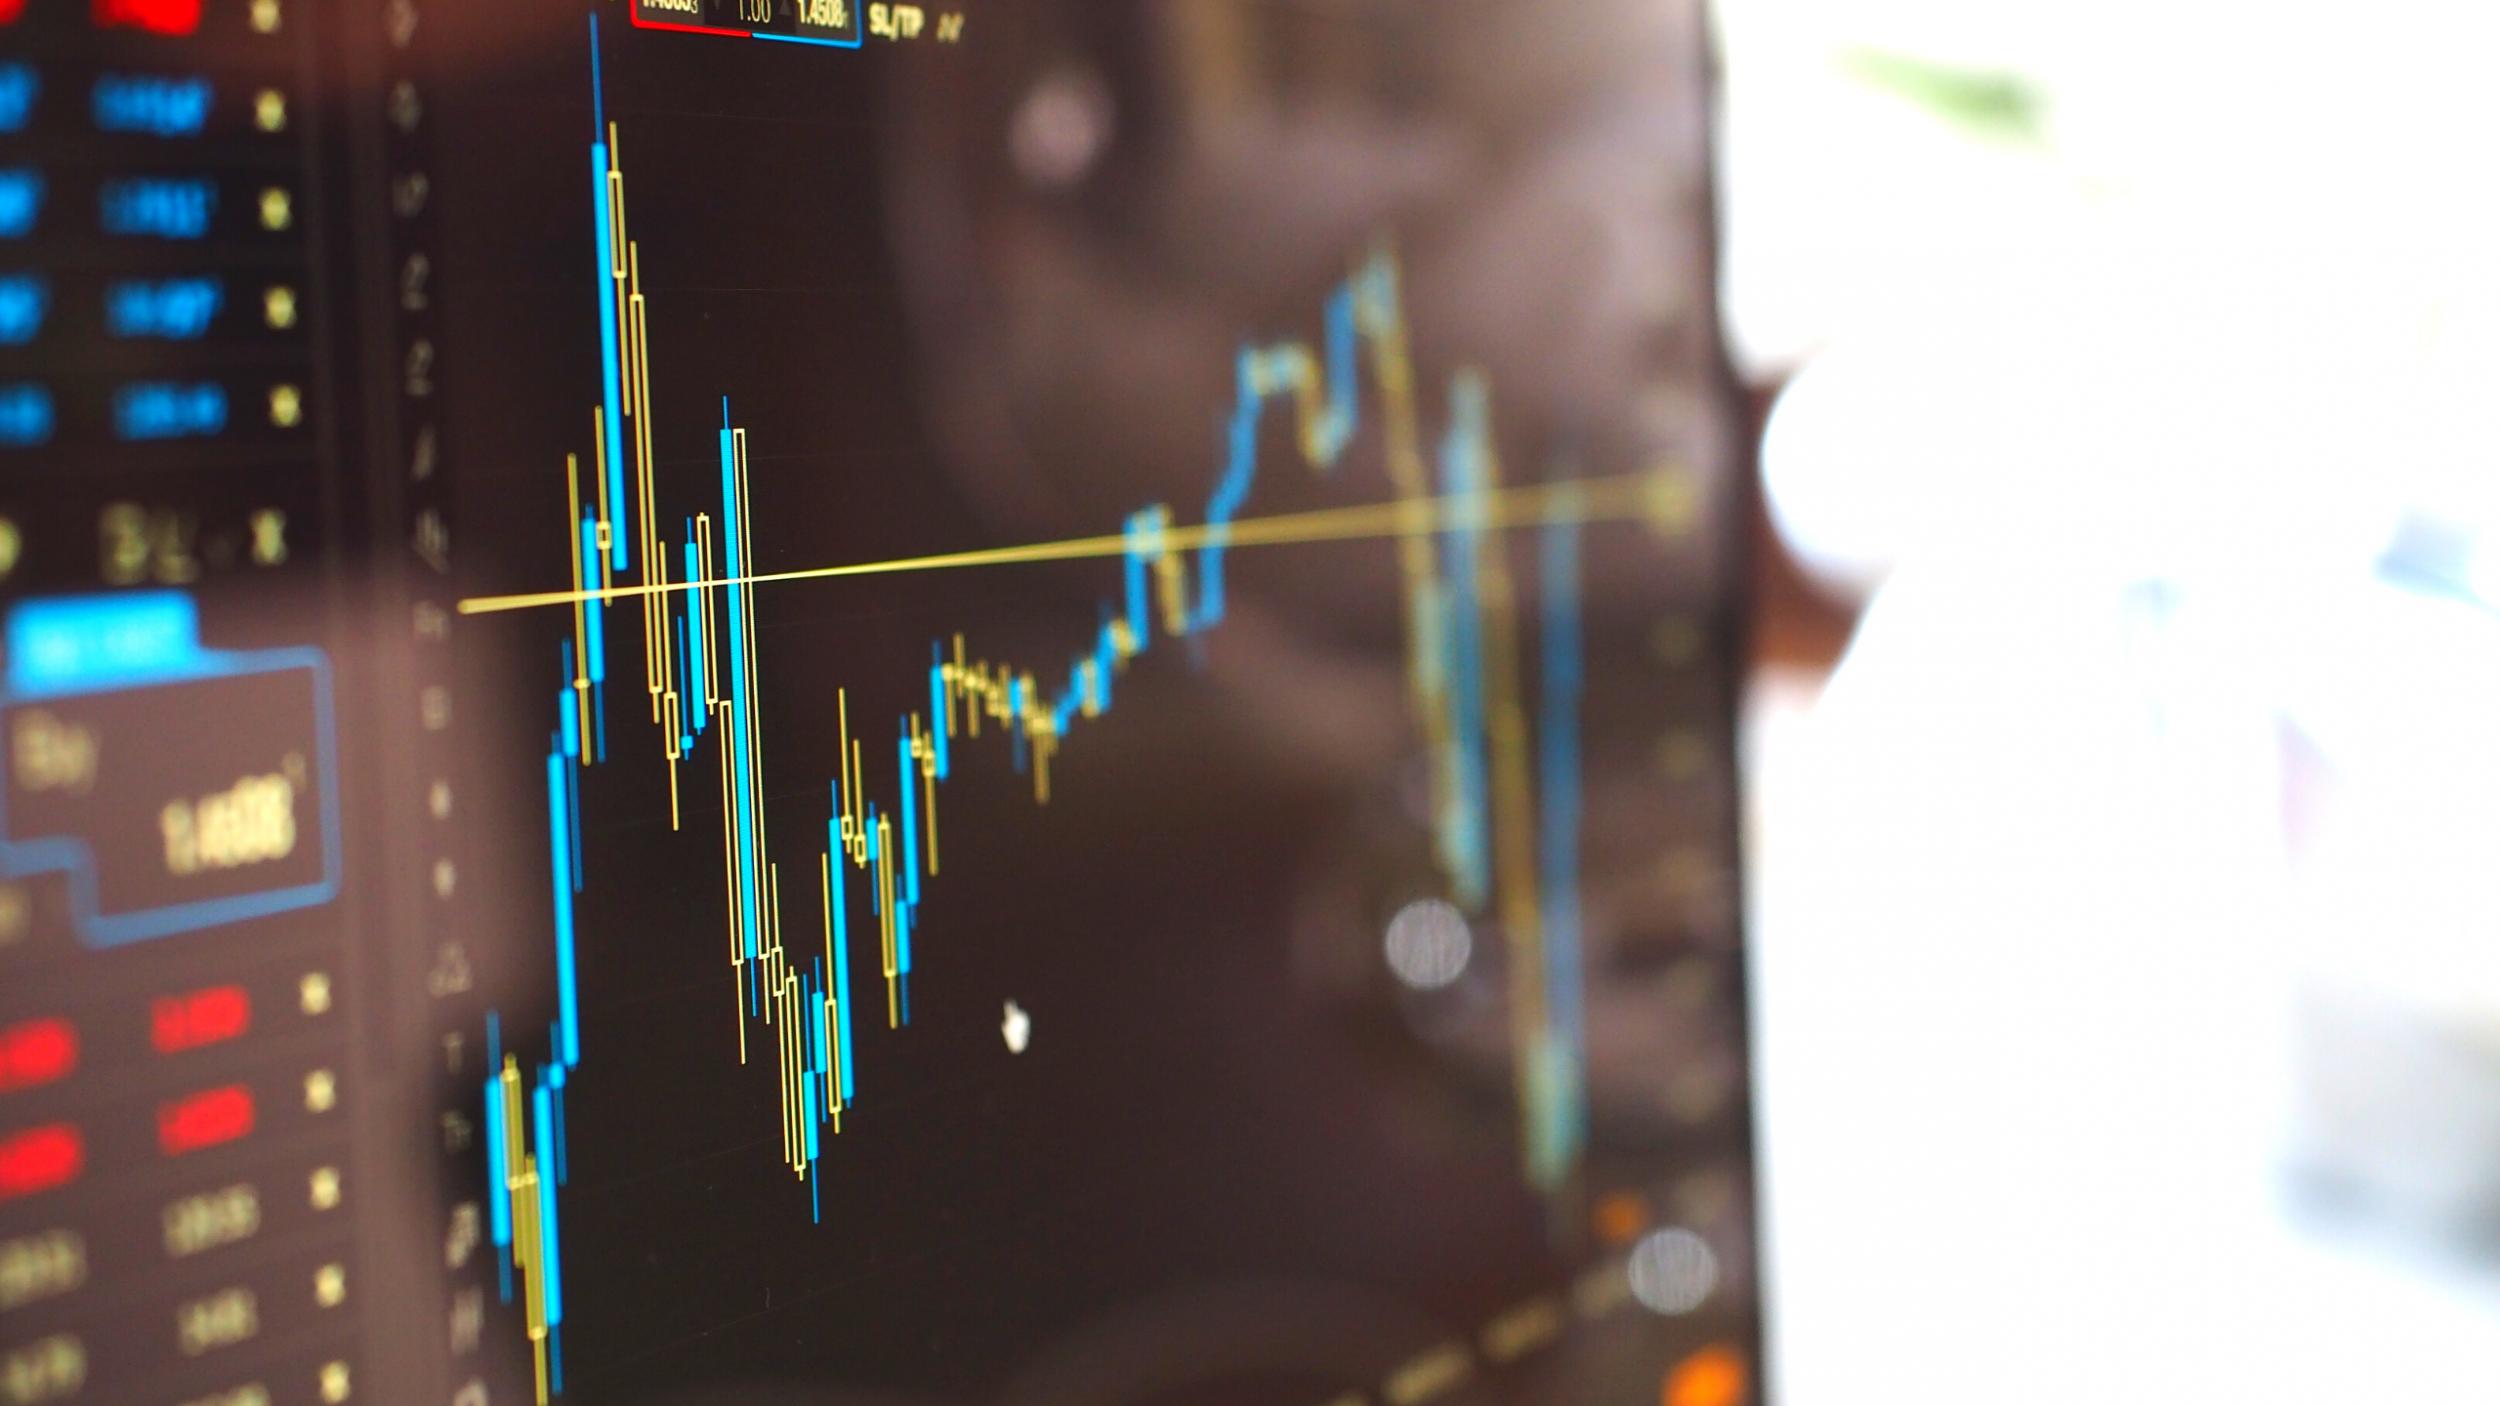 Newsweek AMPLIFY -Stock Market Crash Worries? Explore This Investment Gem